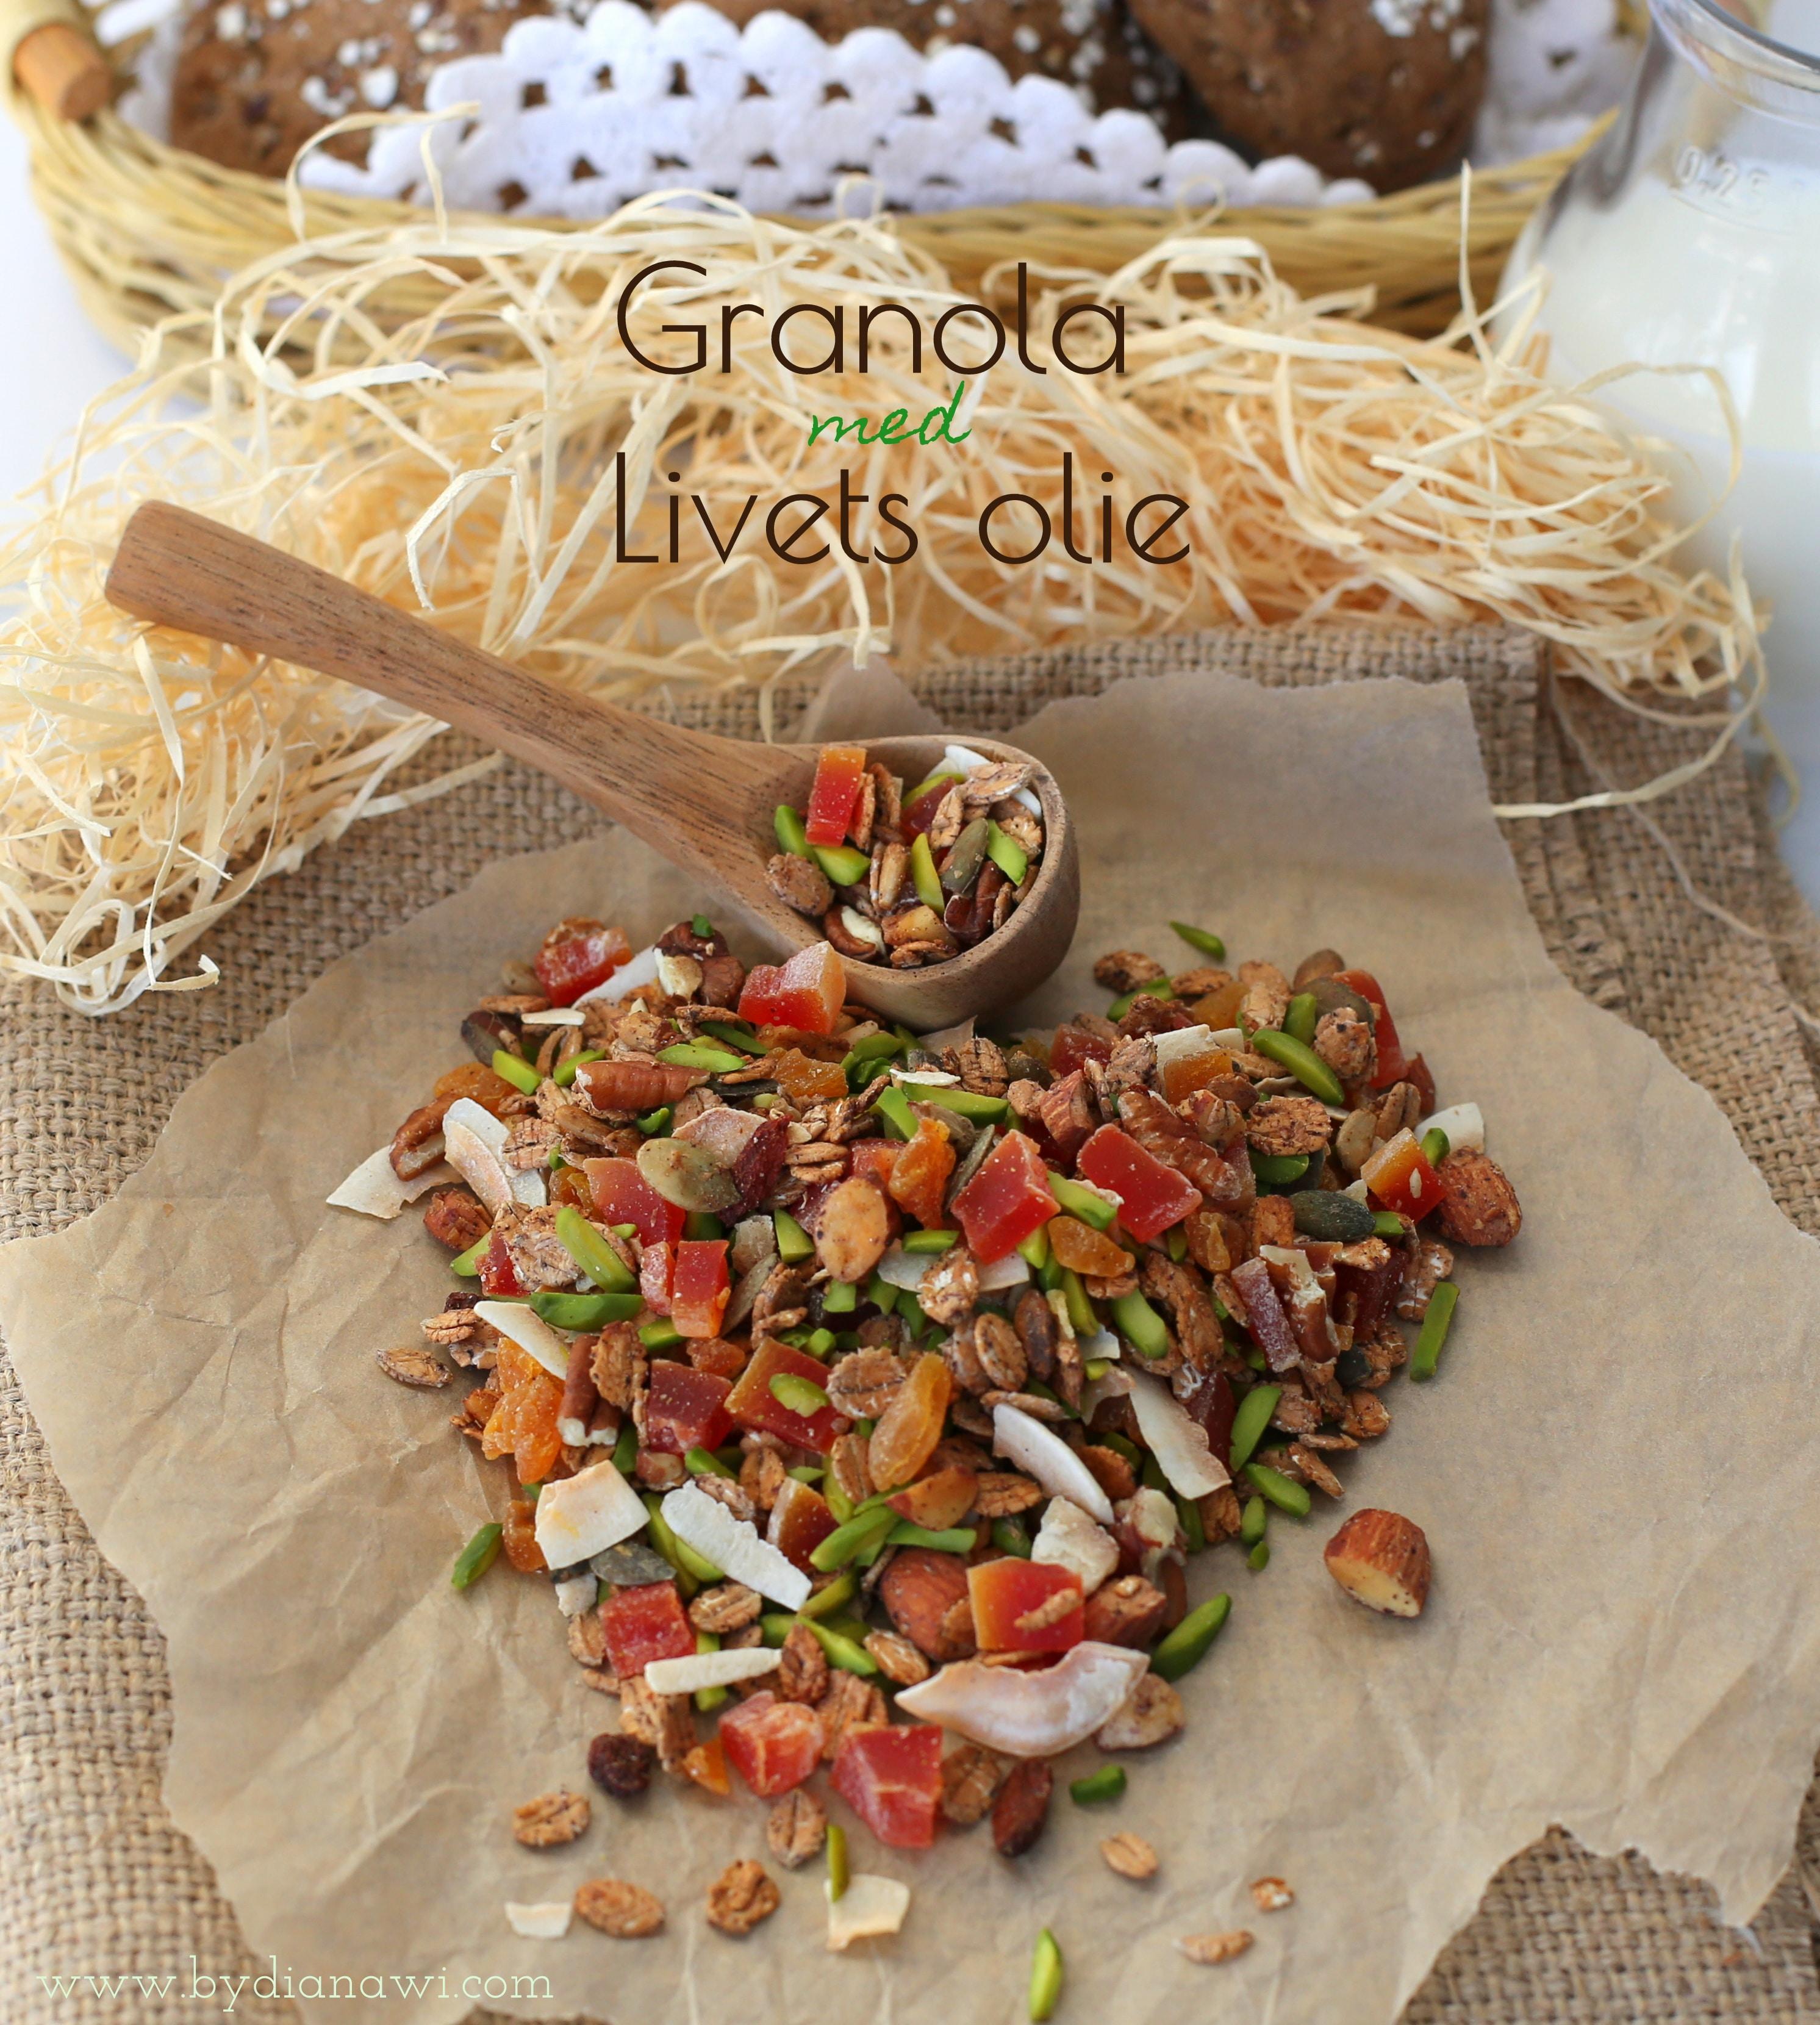 Hjemmelavet granola med Livets olie